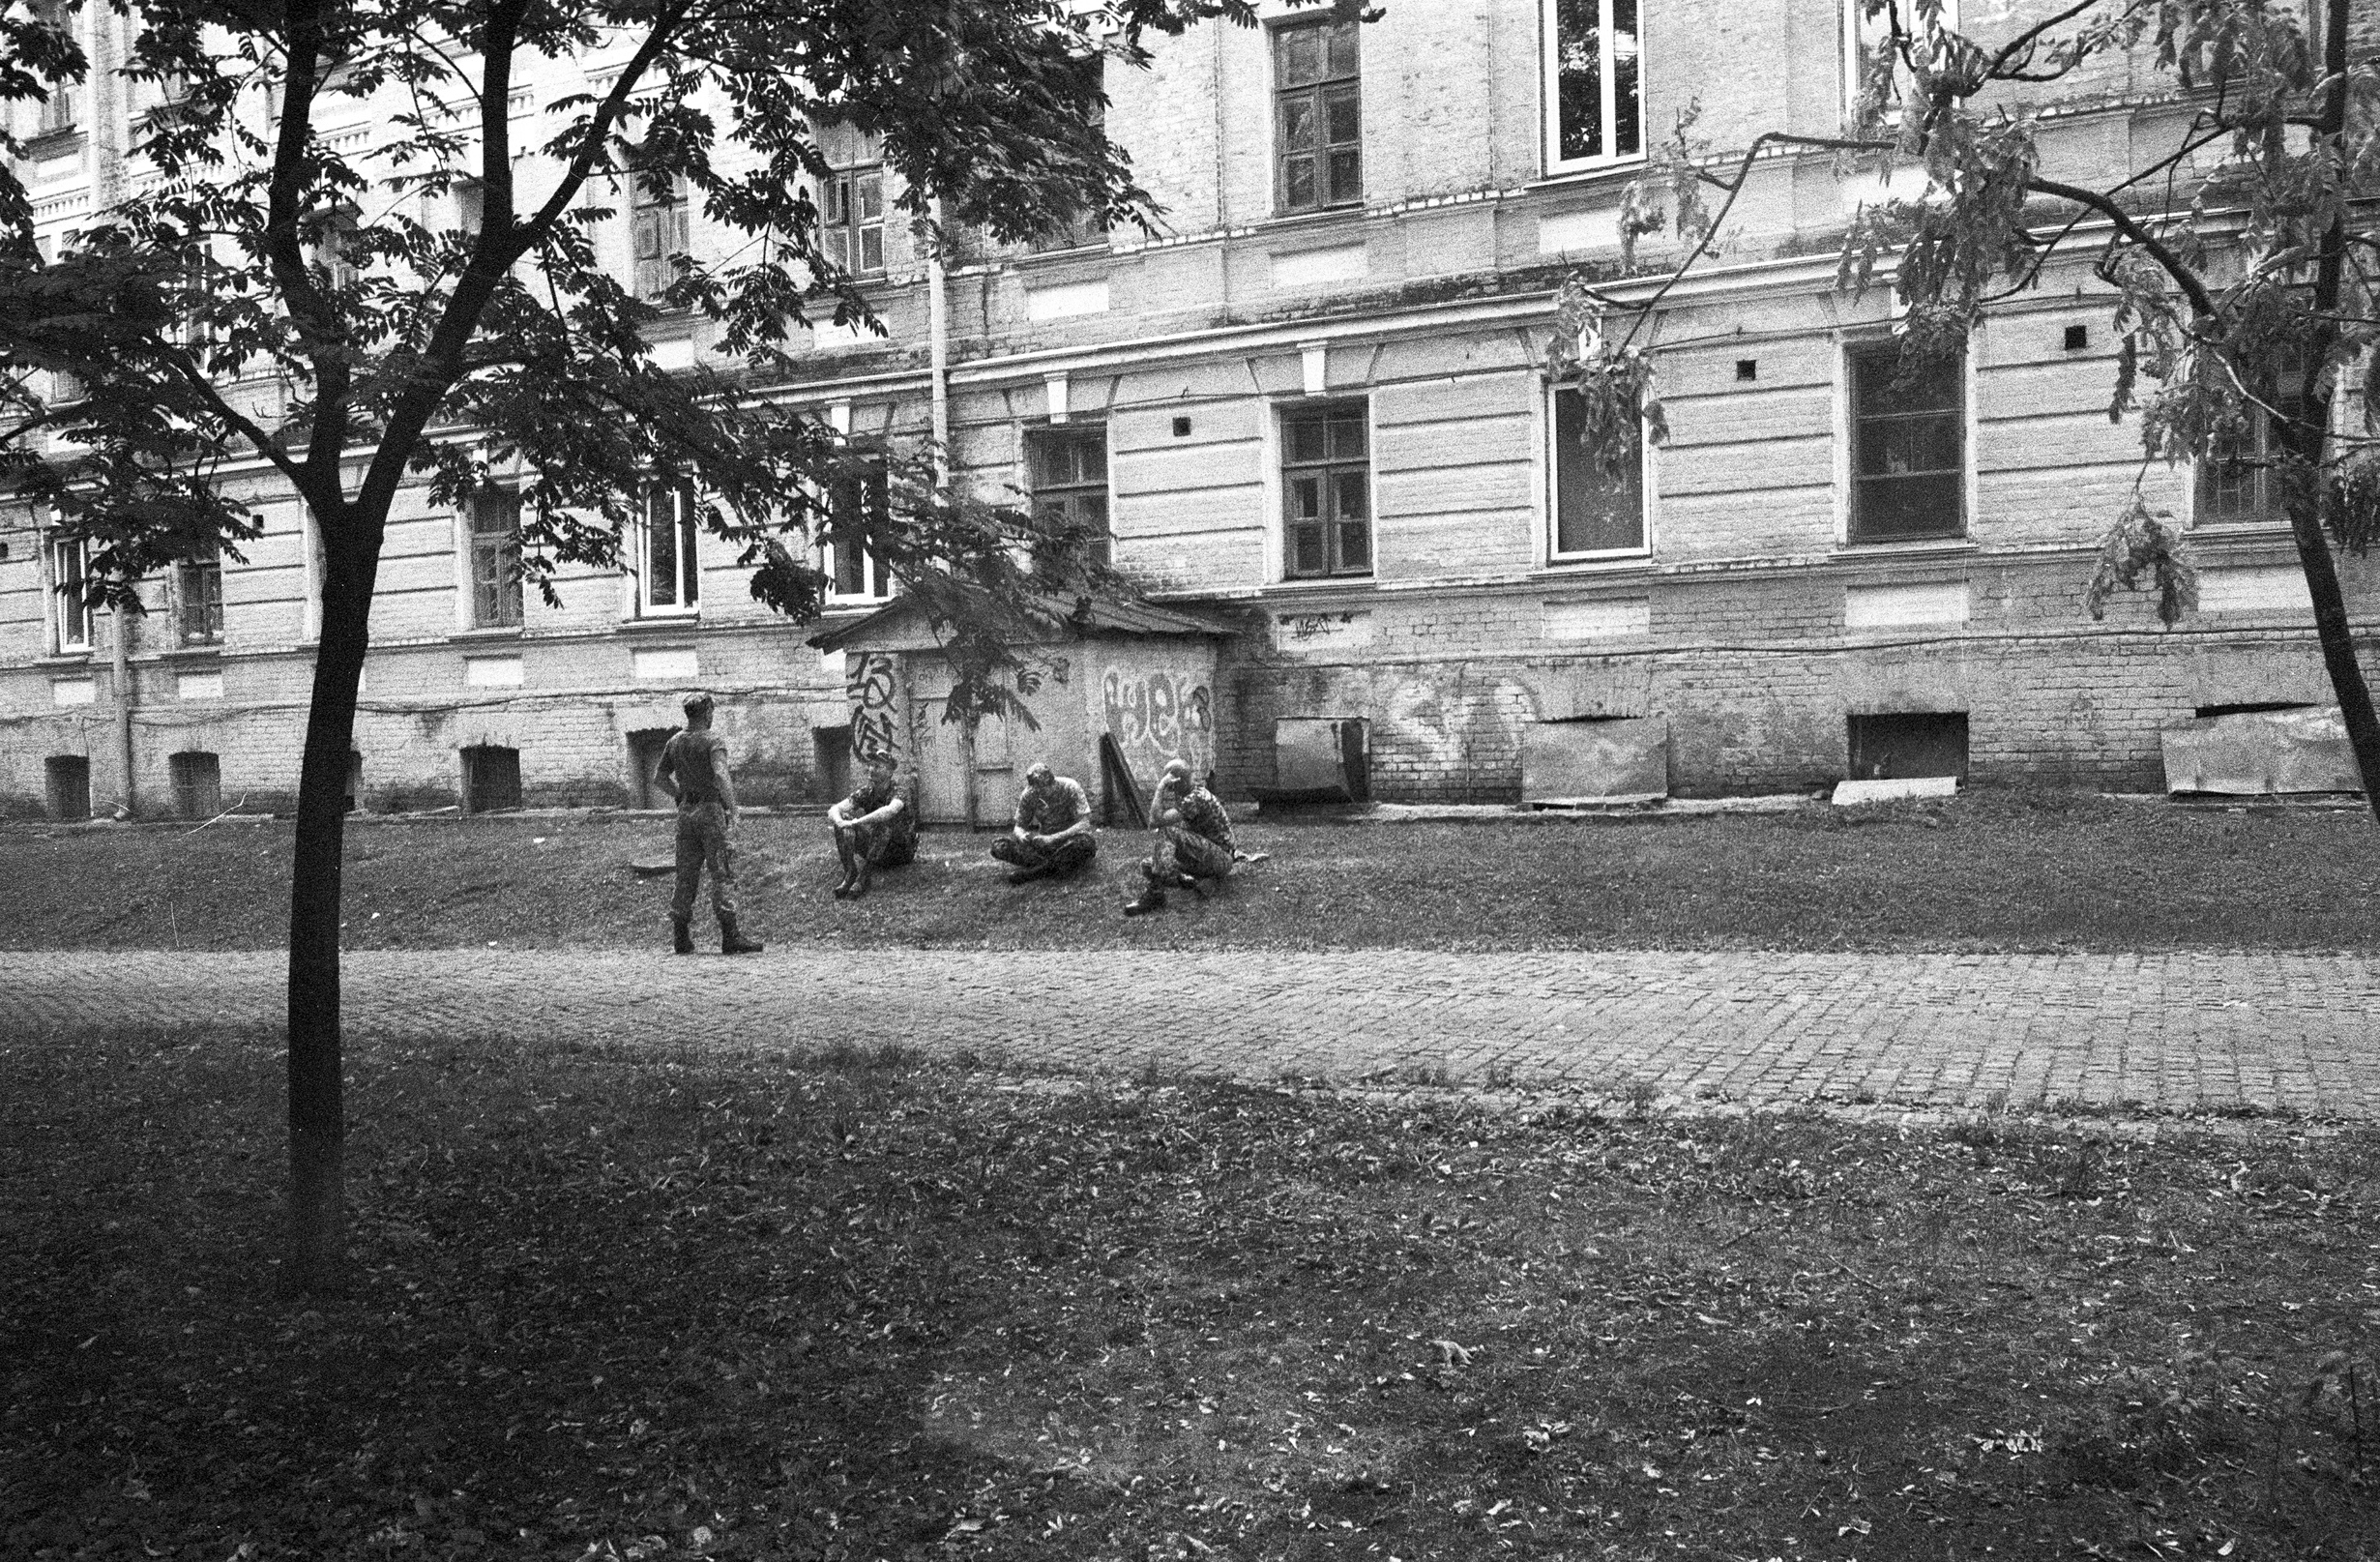 Krieg im Park por_4.jpg